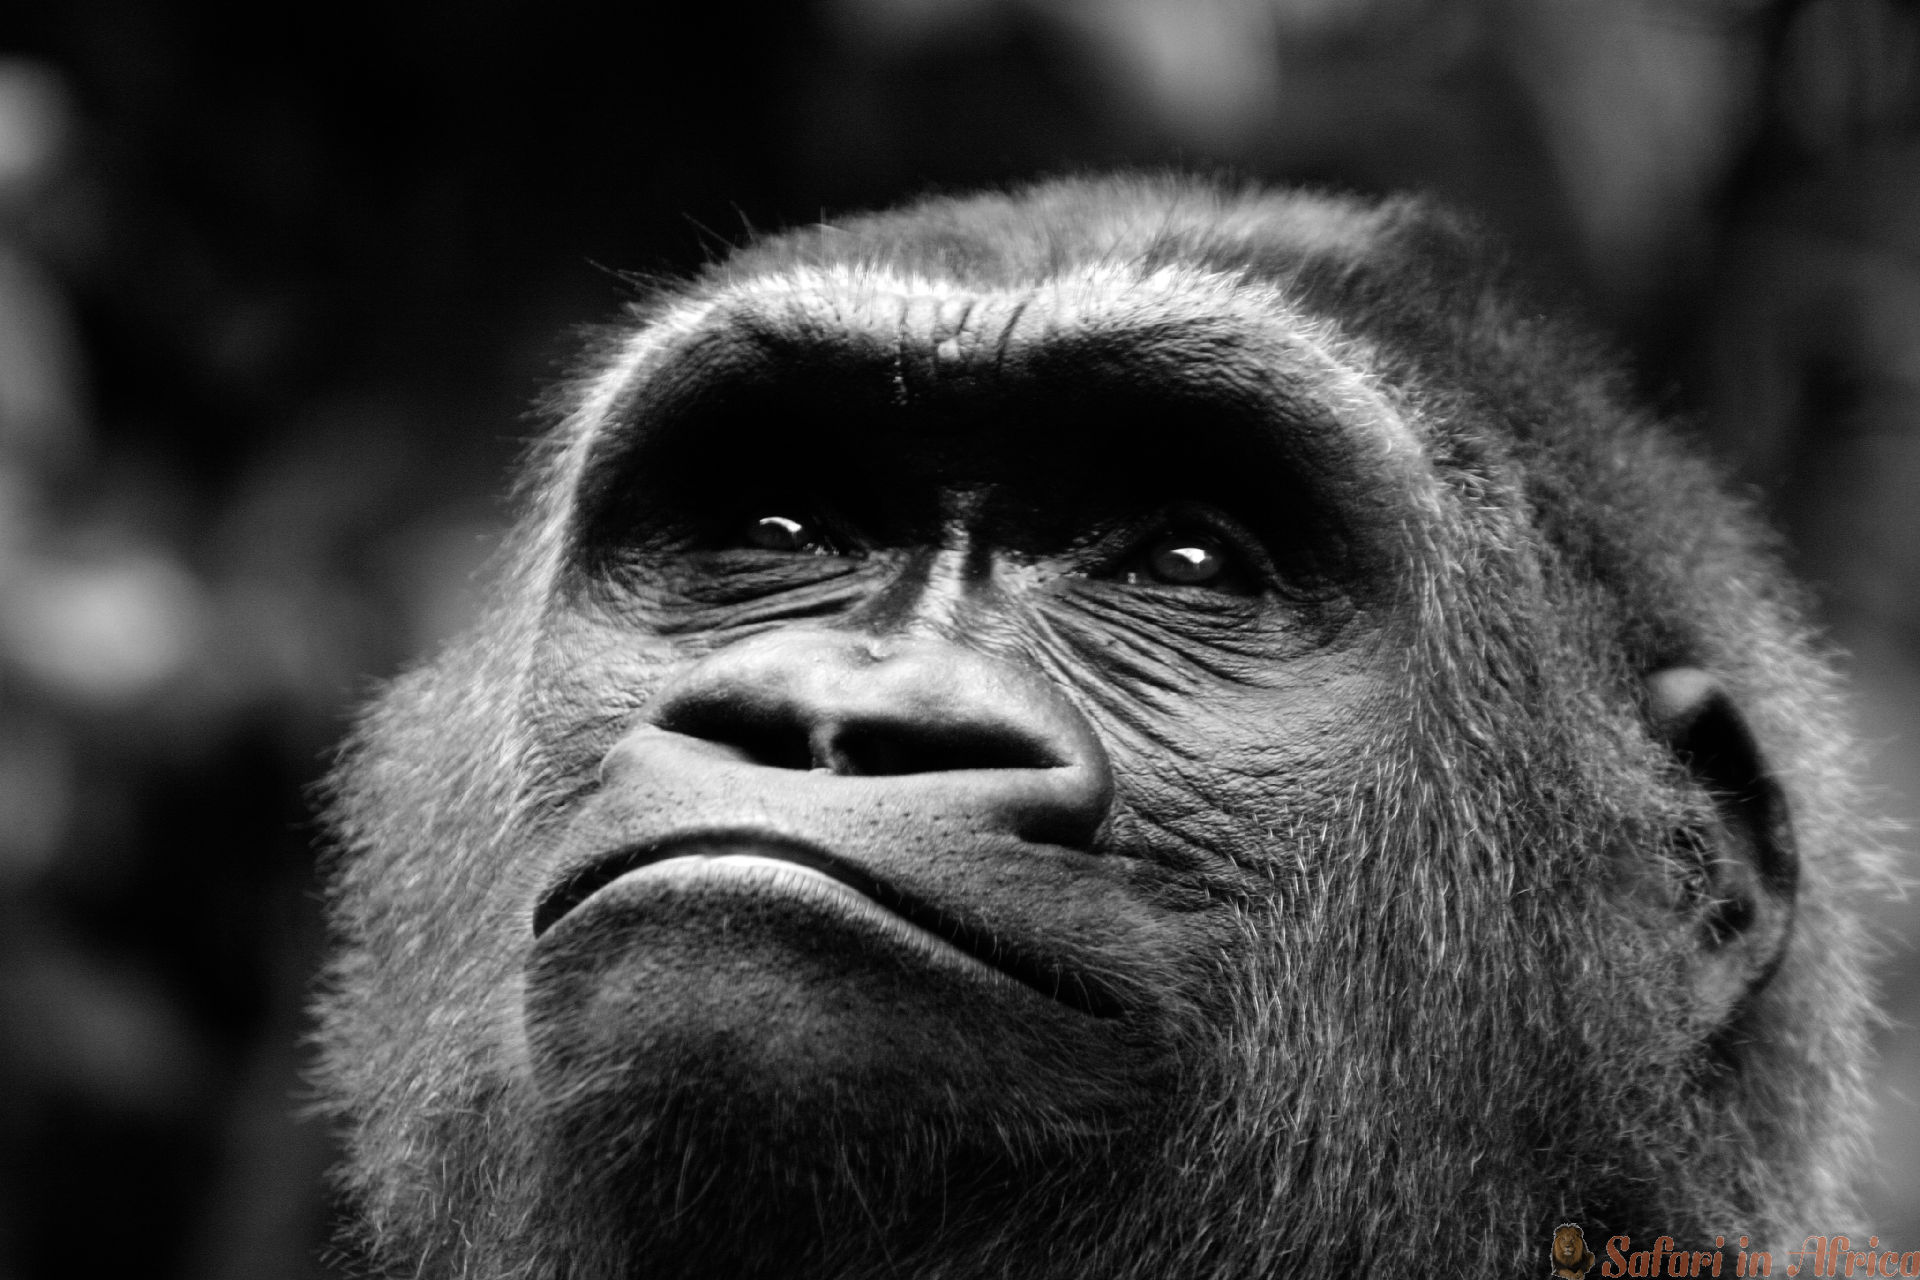 Gorilla close up, Rwanda 2 B&W